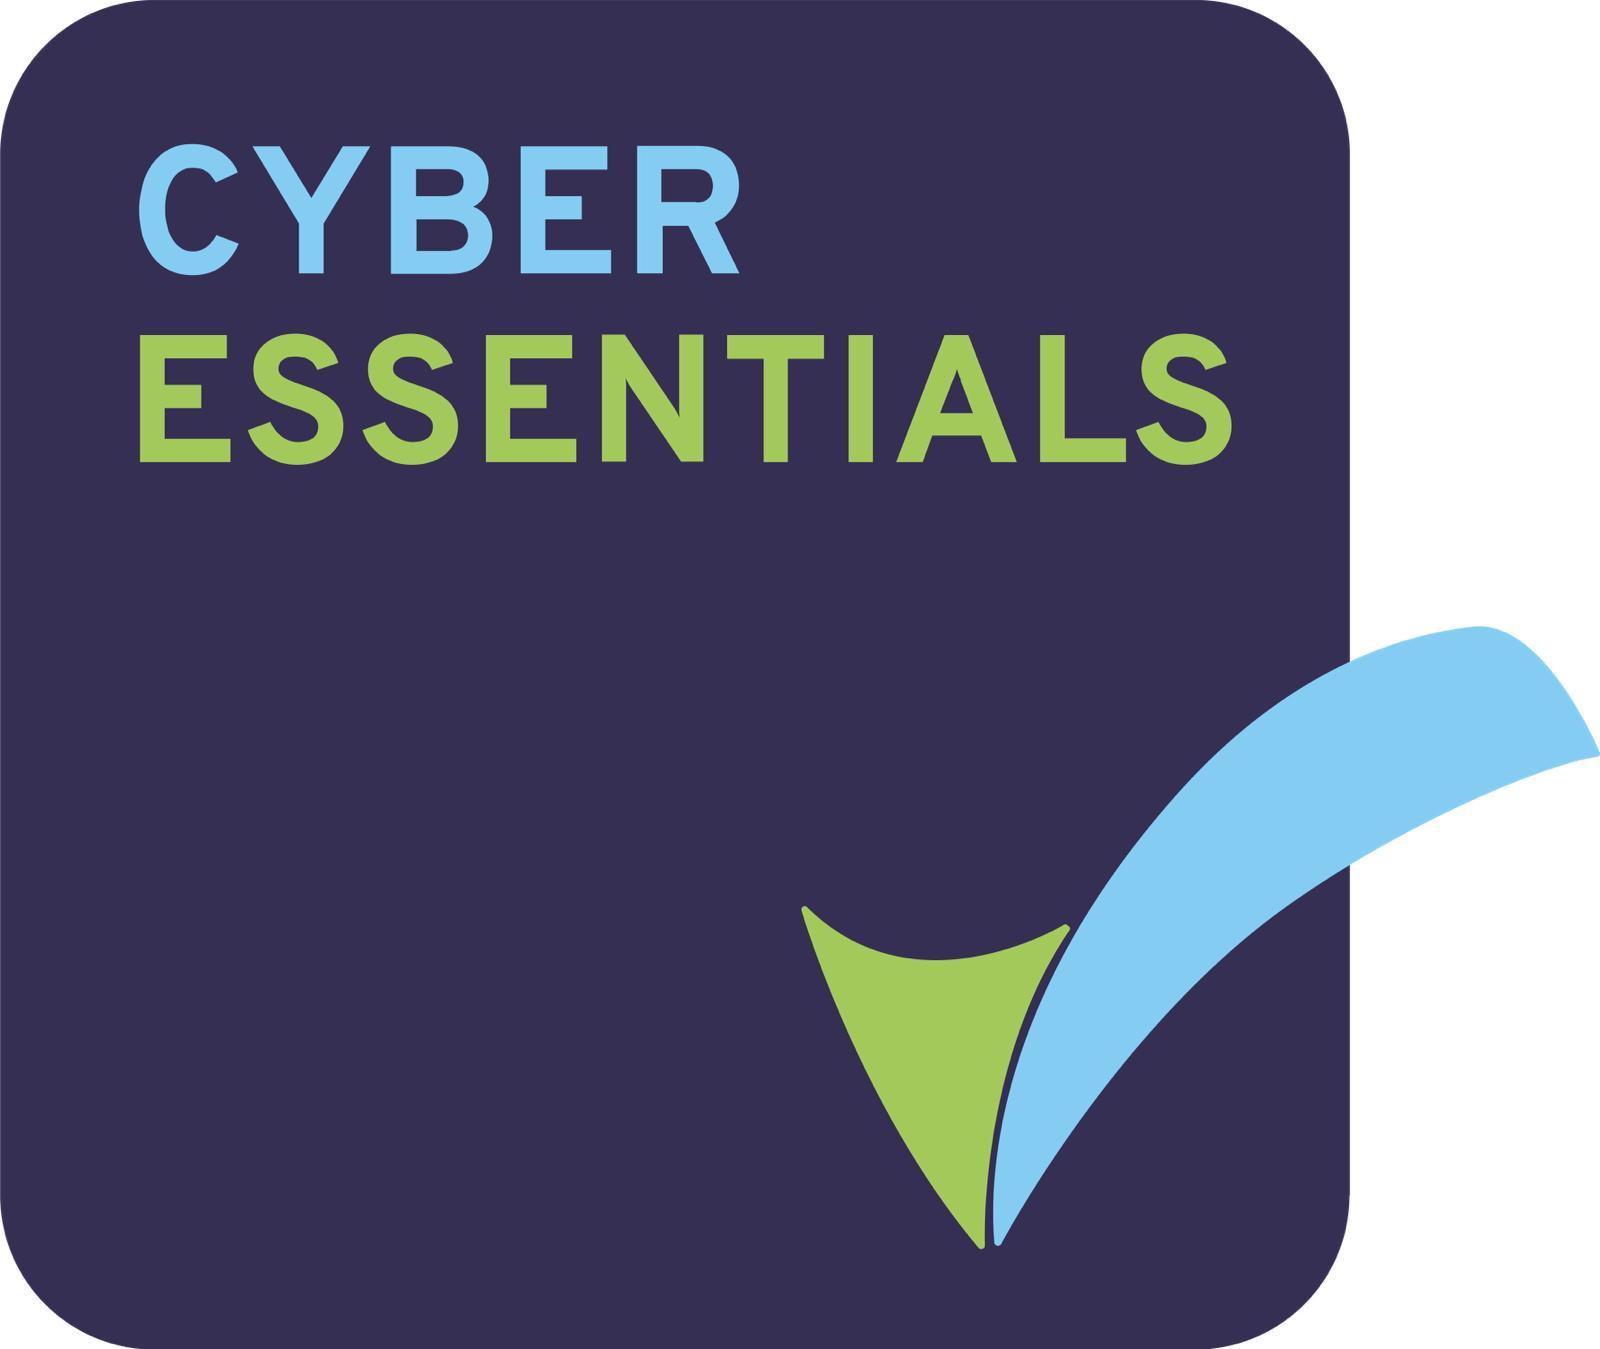 Cyber Essential